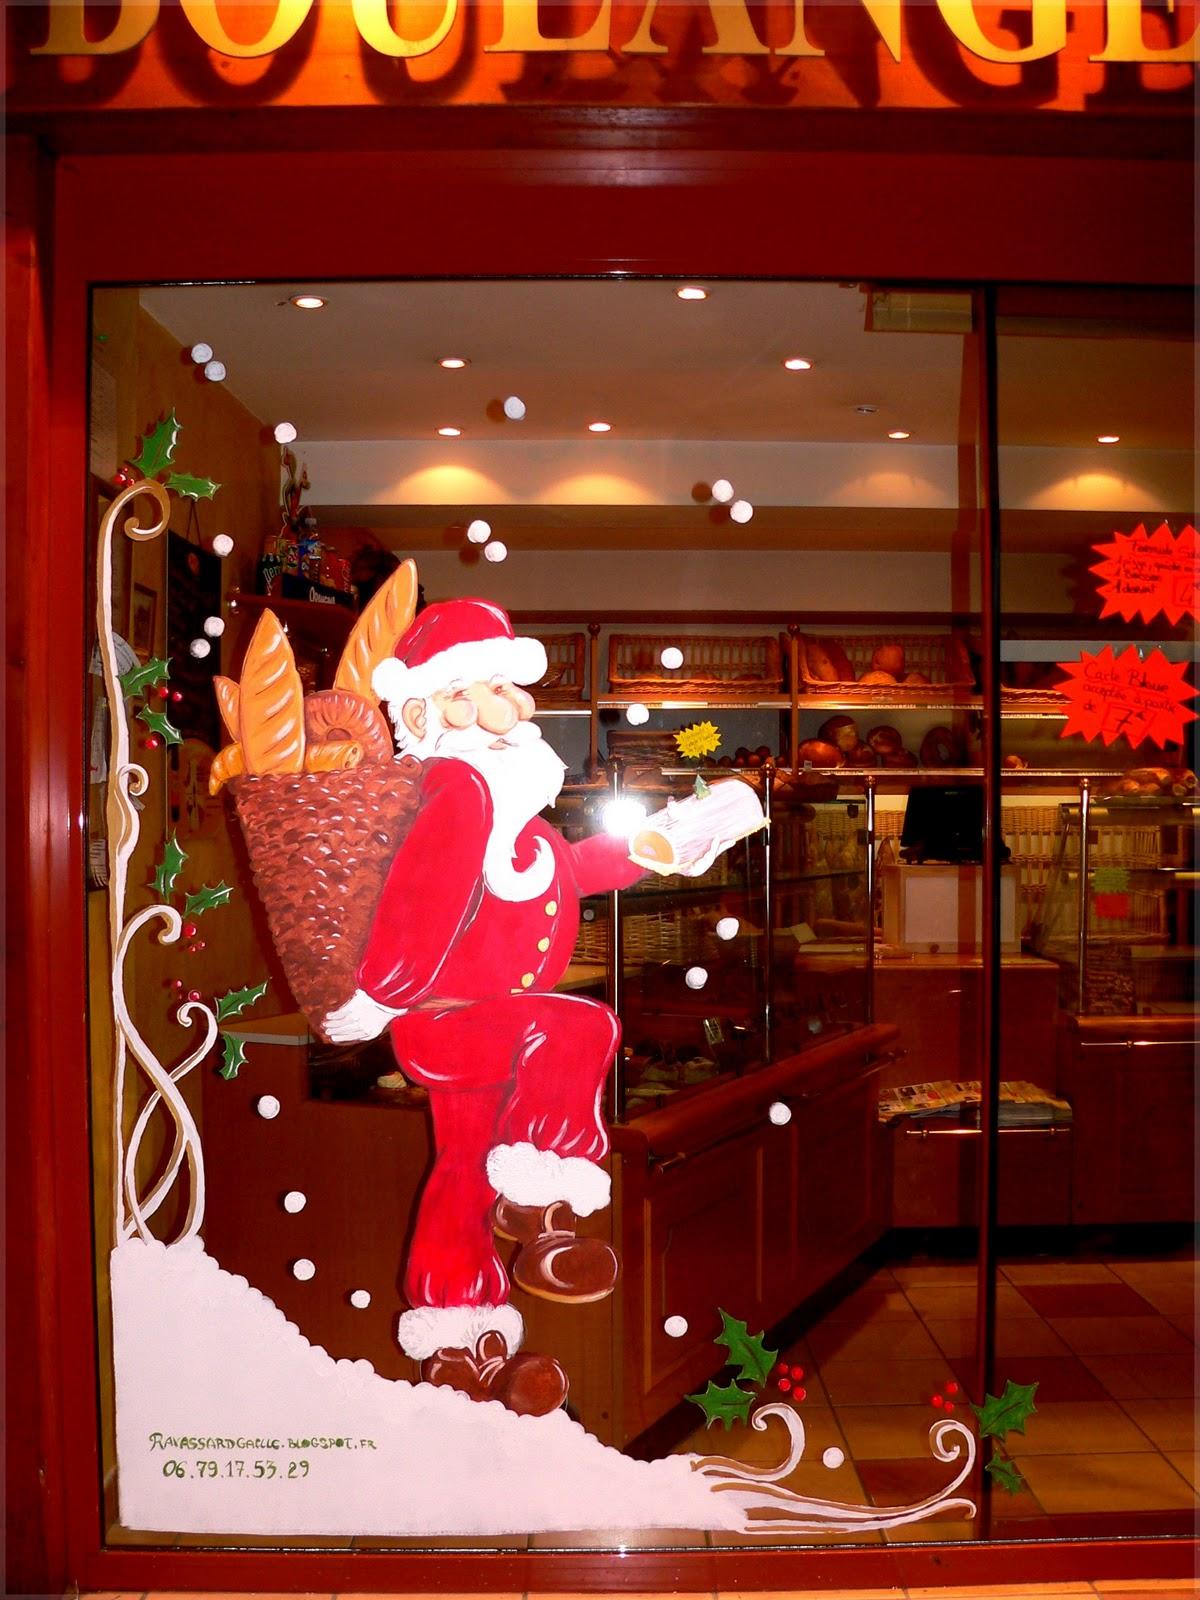 Ravassard ga lle cr ation vitrine de no l boulangerie - Decoration de vitrine de noel ...